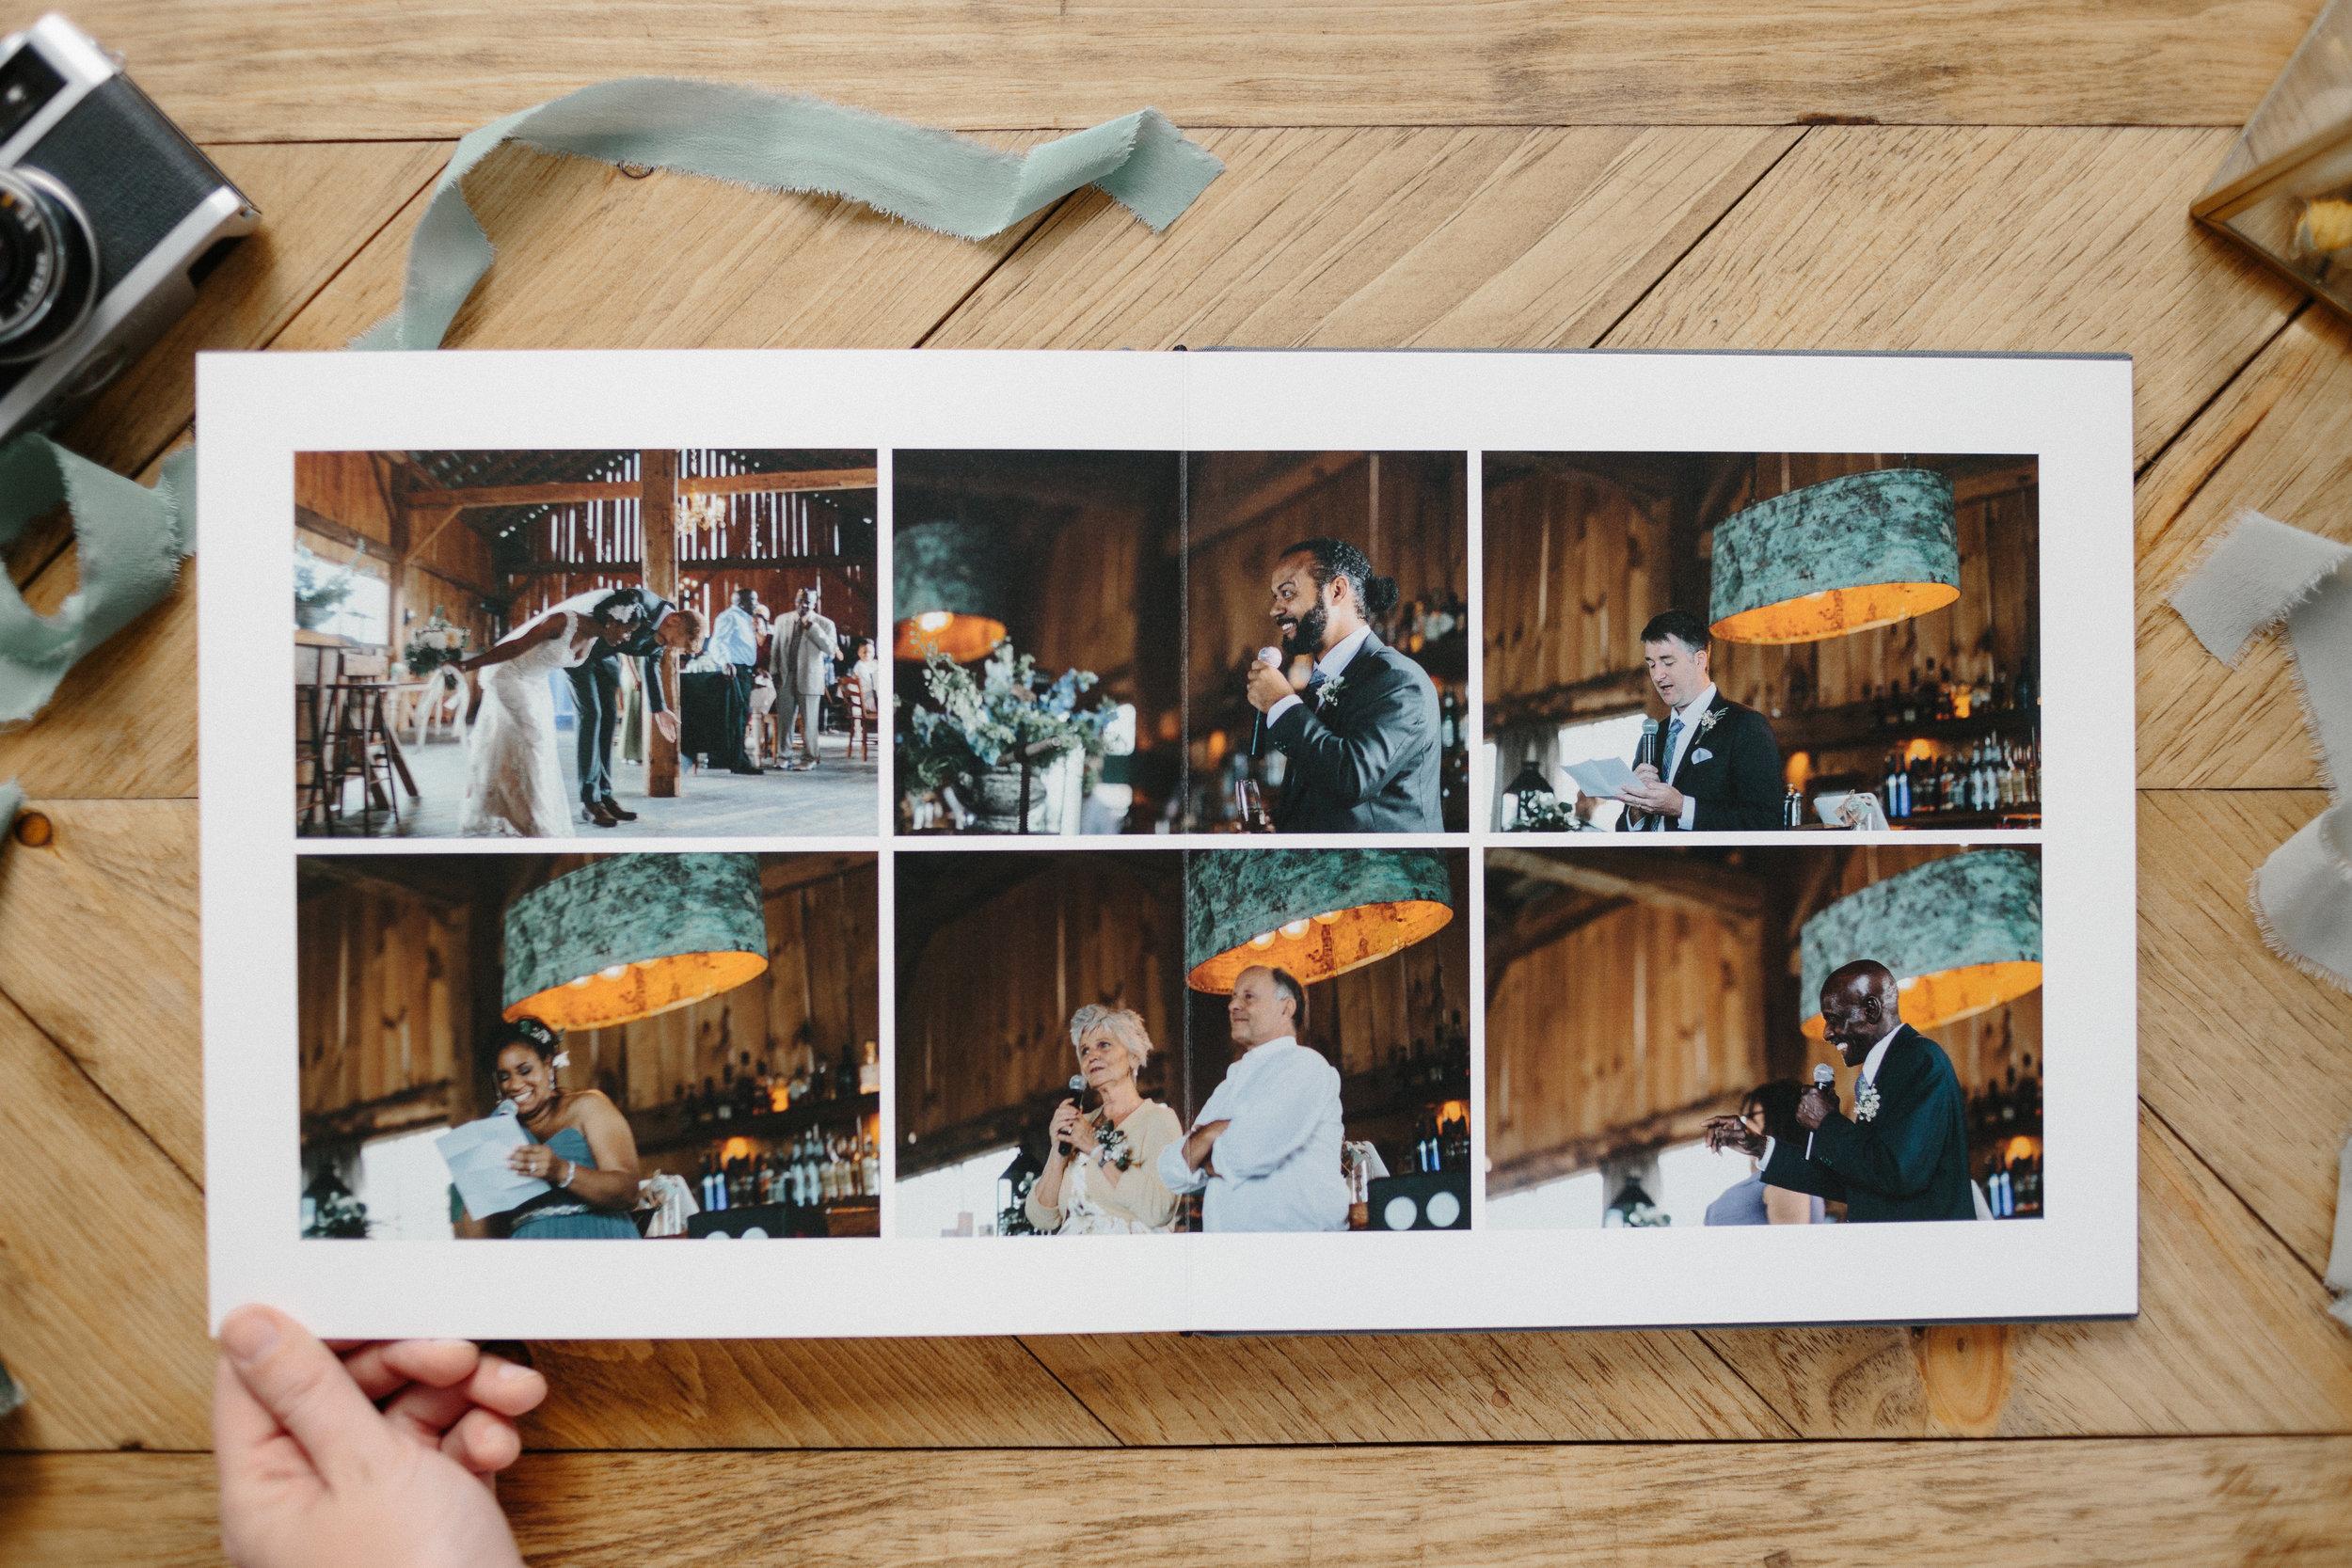 ryanne-hollies-photography-wedding-album-design-details-tono-and-co-artifact-uprising-70.jpg